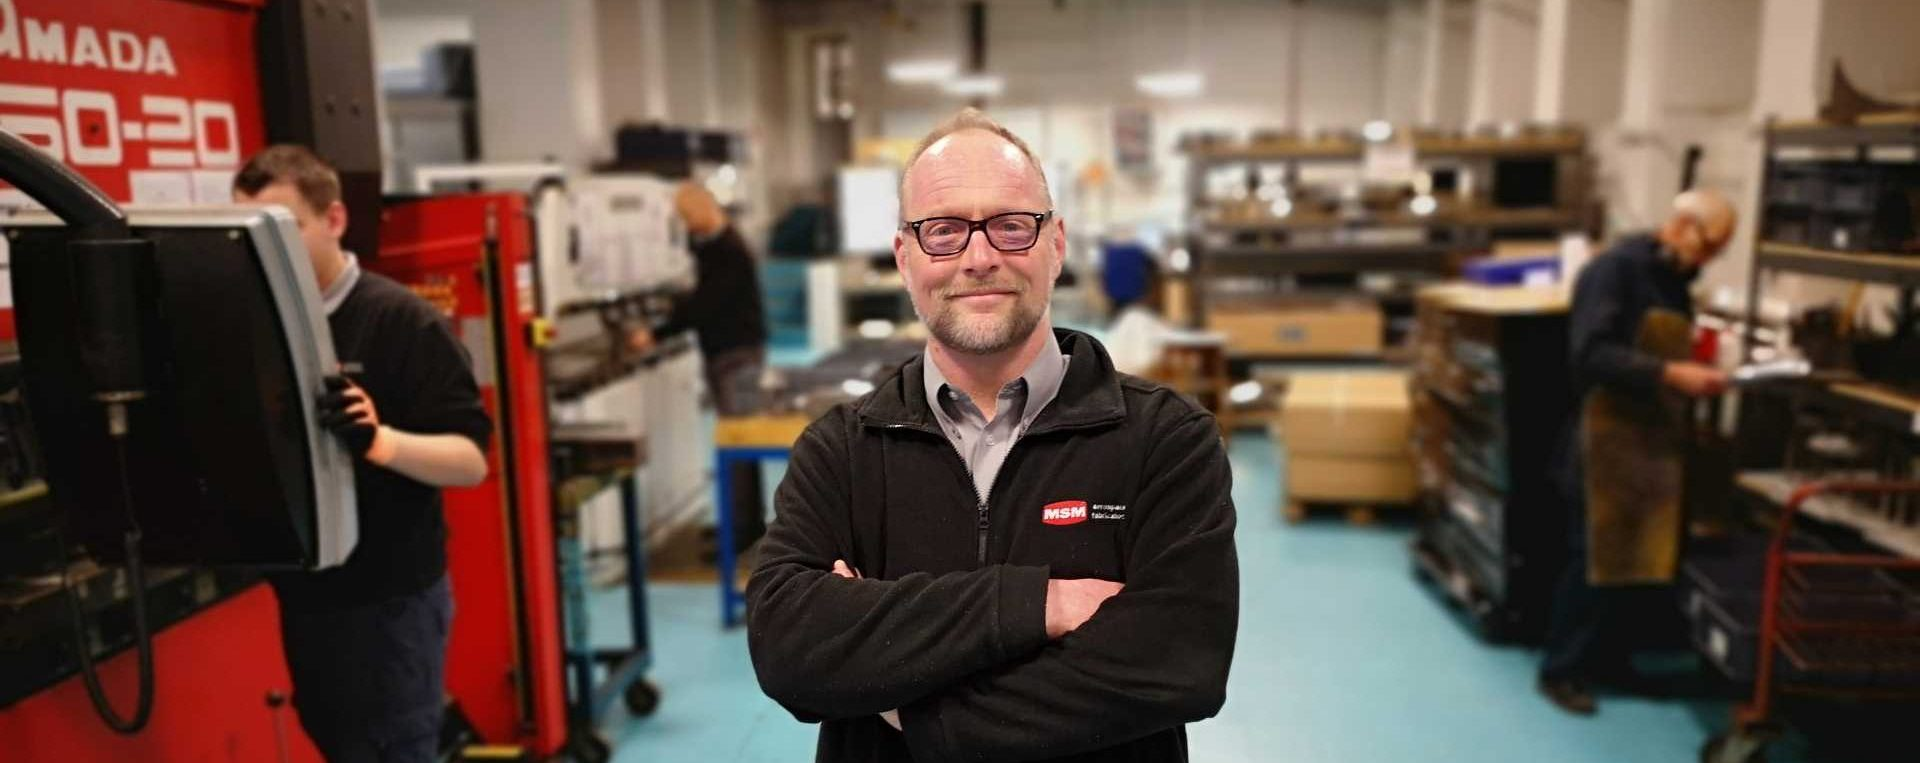 Michael Pedley, managing director of MSM aerospace fabricators - image courtesy of Made Smarter.